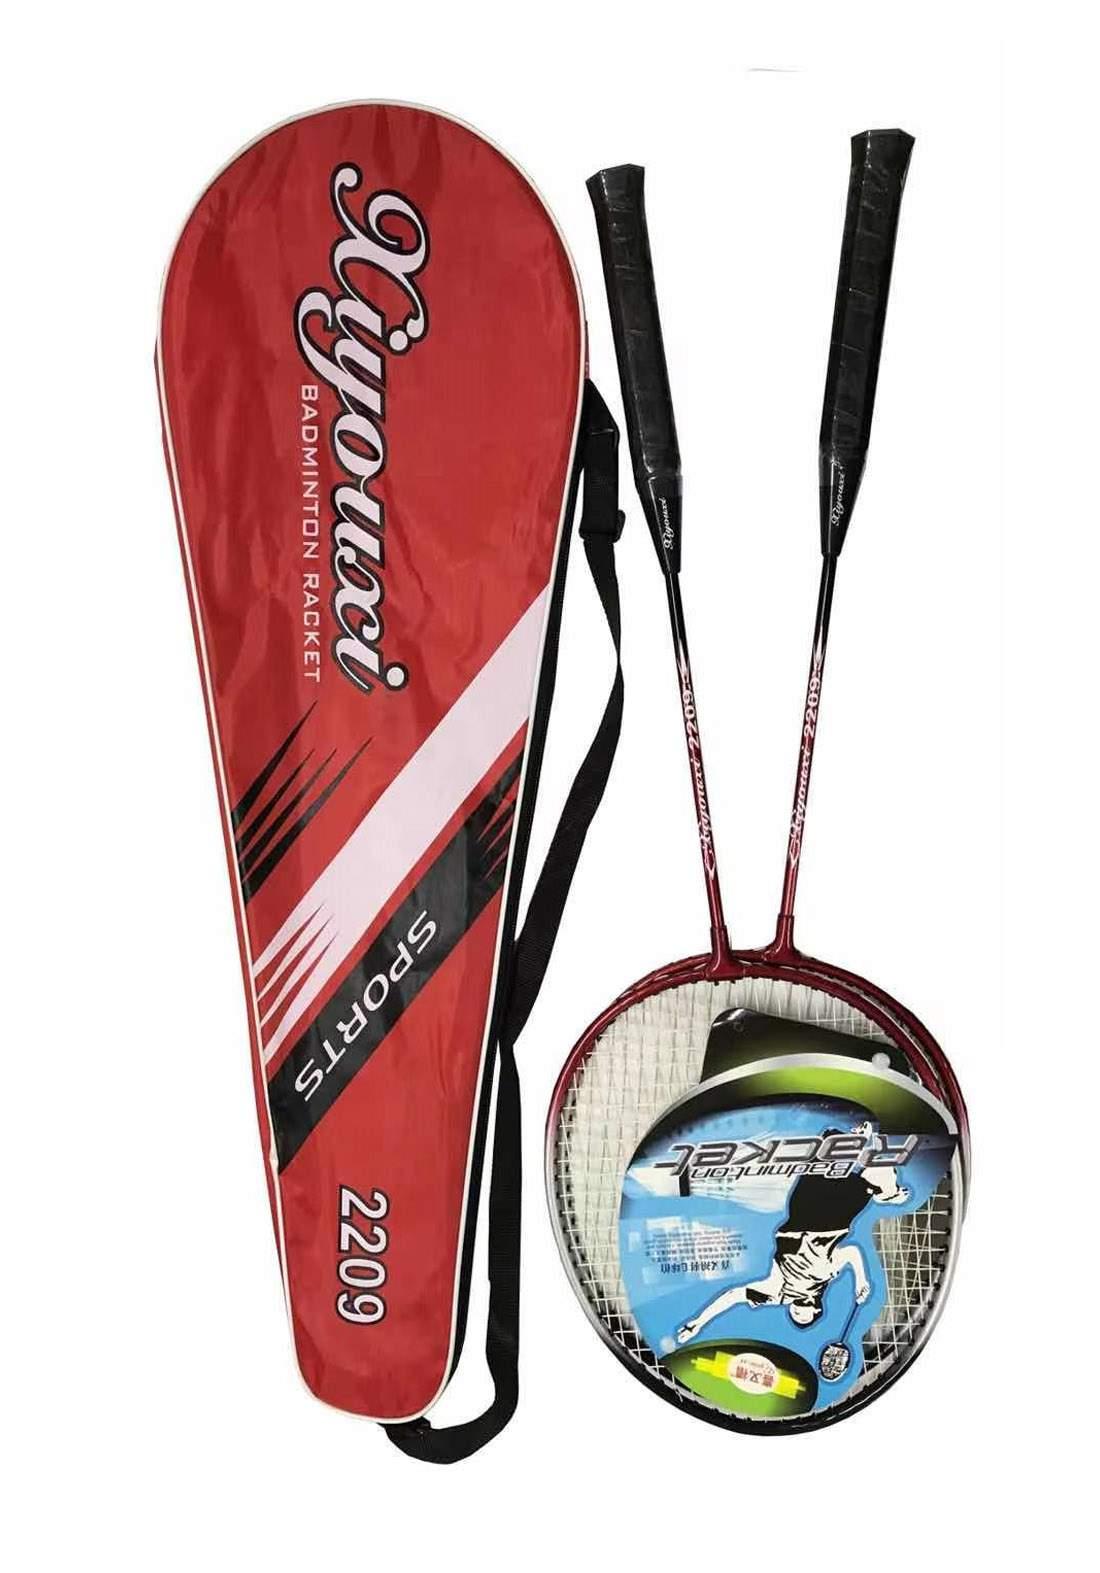 Xiyouxi  Badminton Racket مضرب ريشة